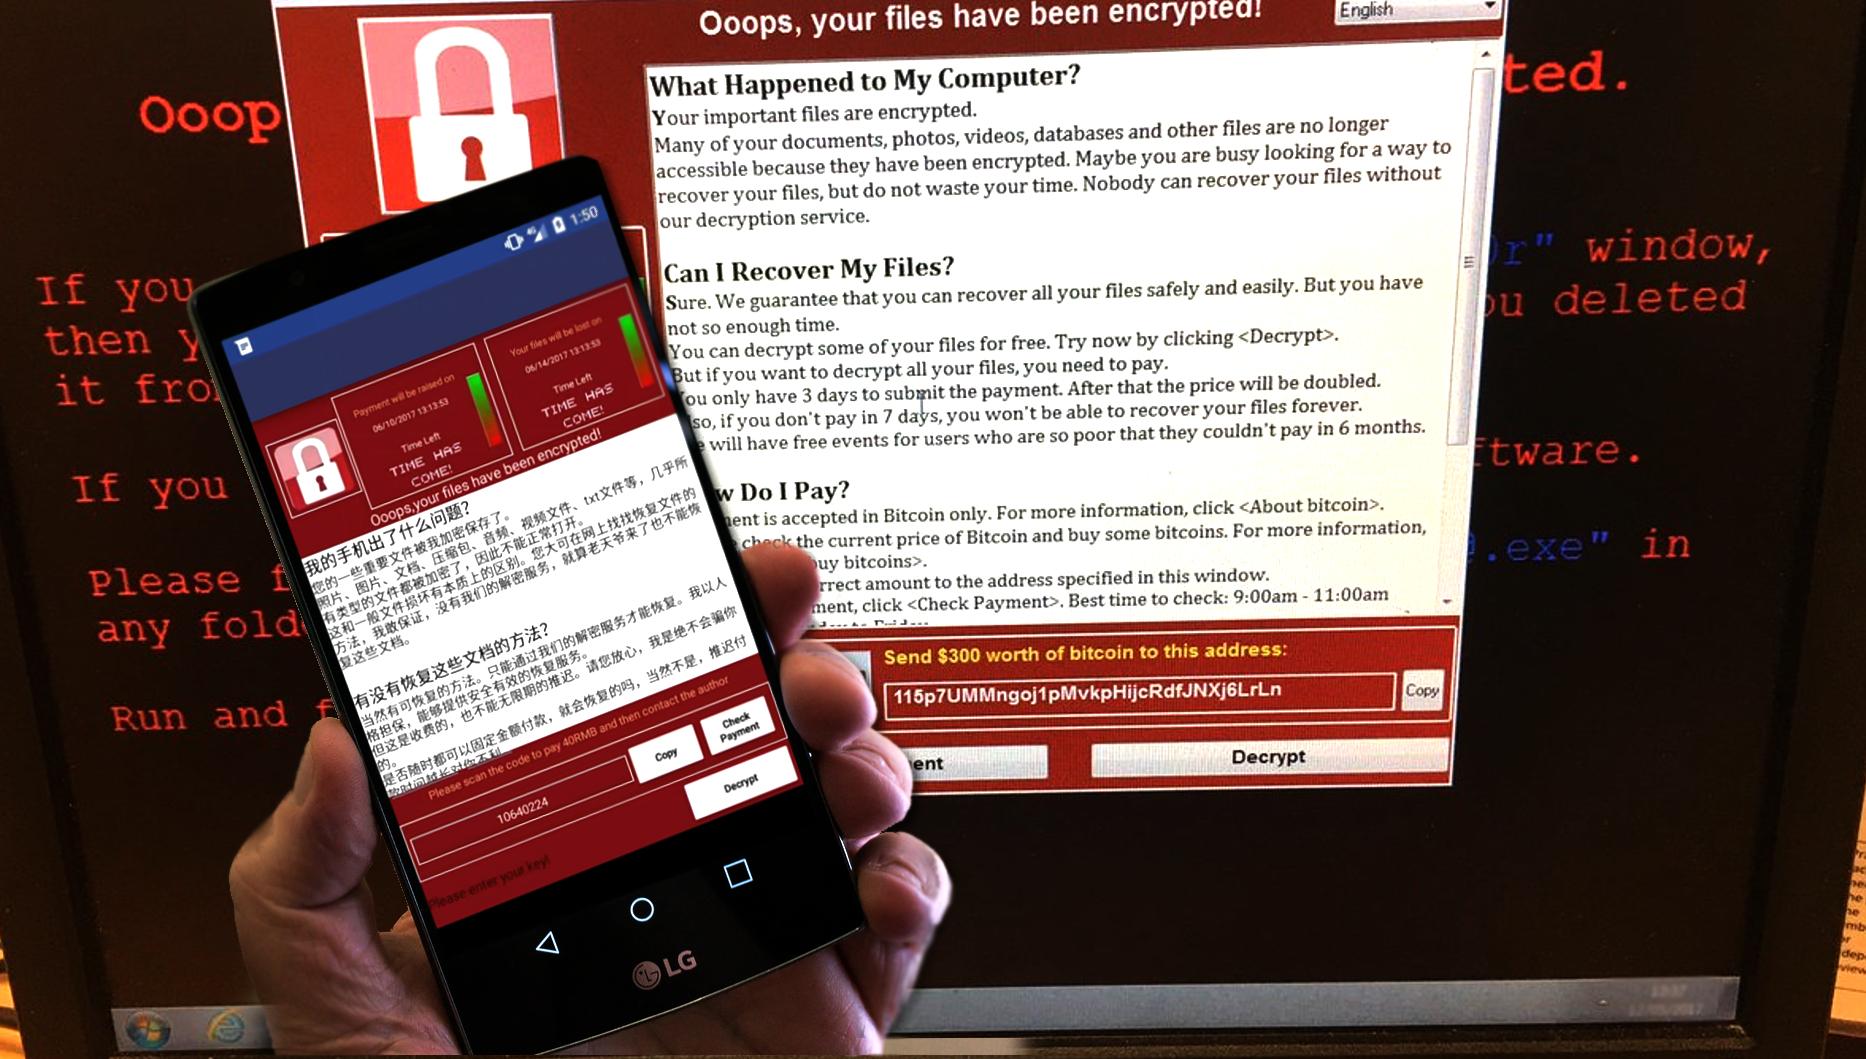 More WannaCry victims expected as WannaCry 3.0 and WannaLocker emerge snapshot